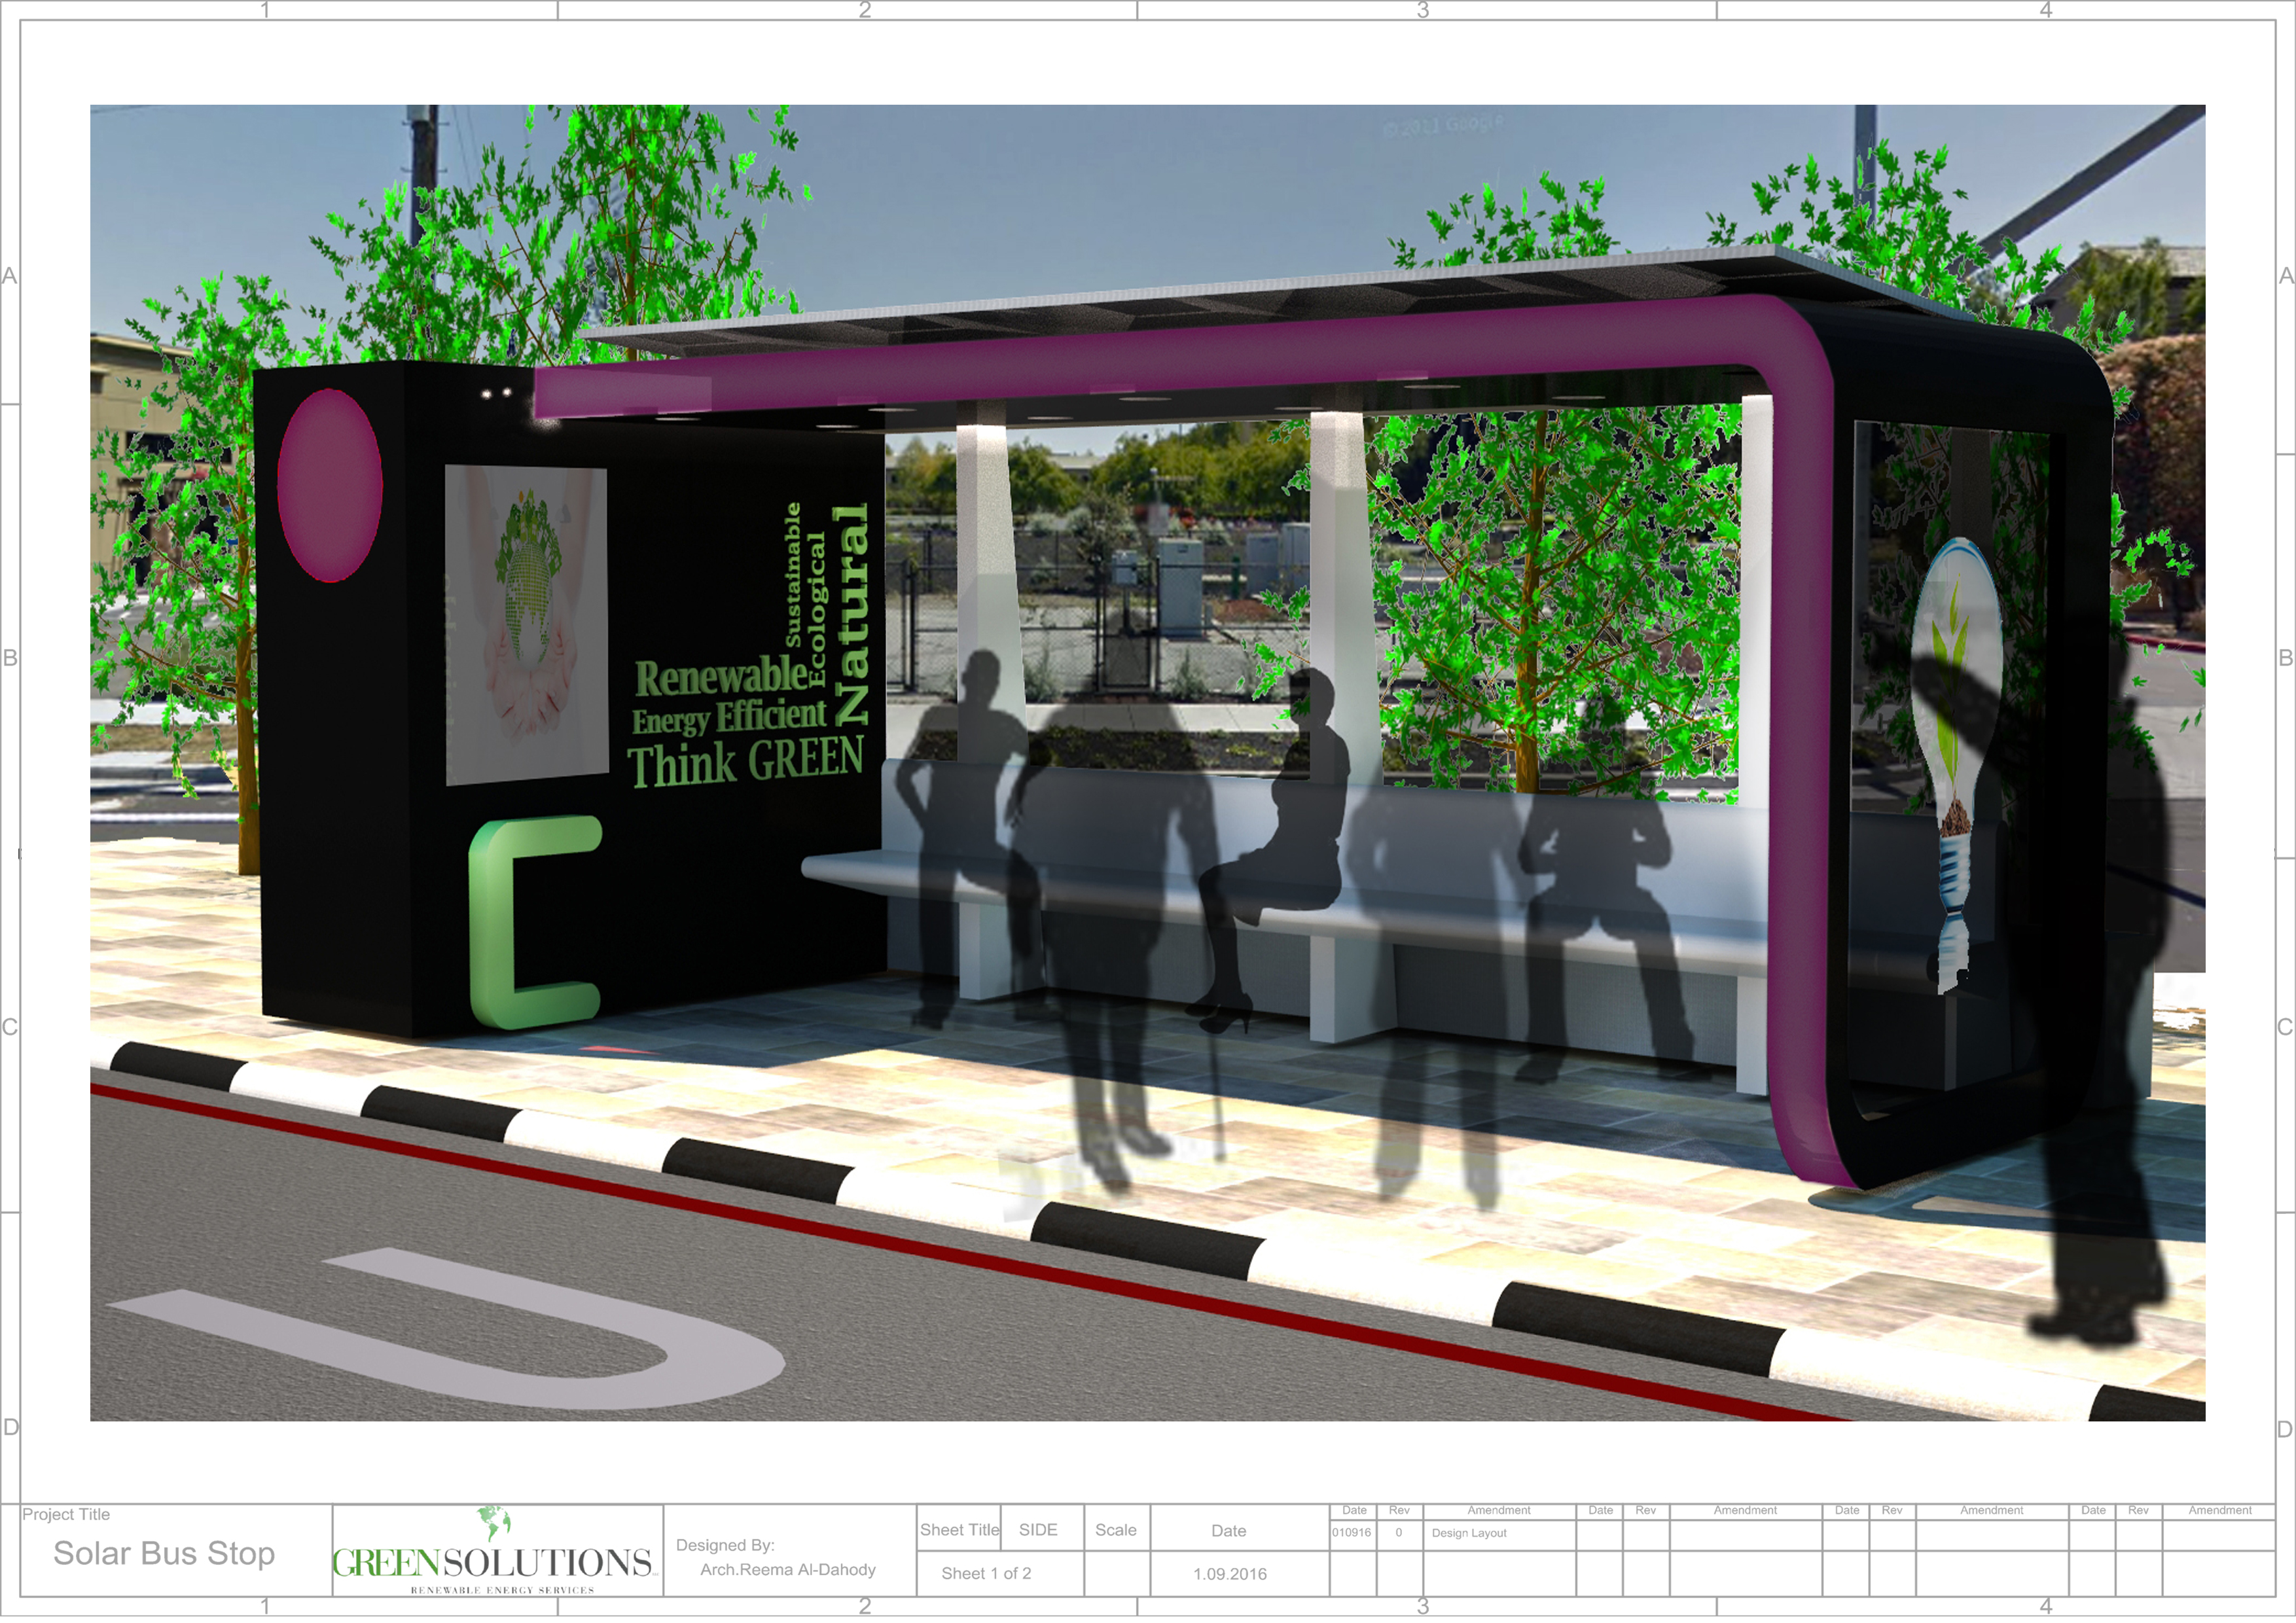 Solar Bus Stop Concept